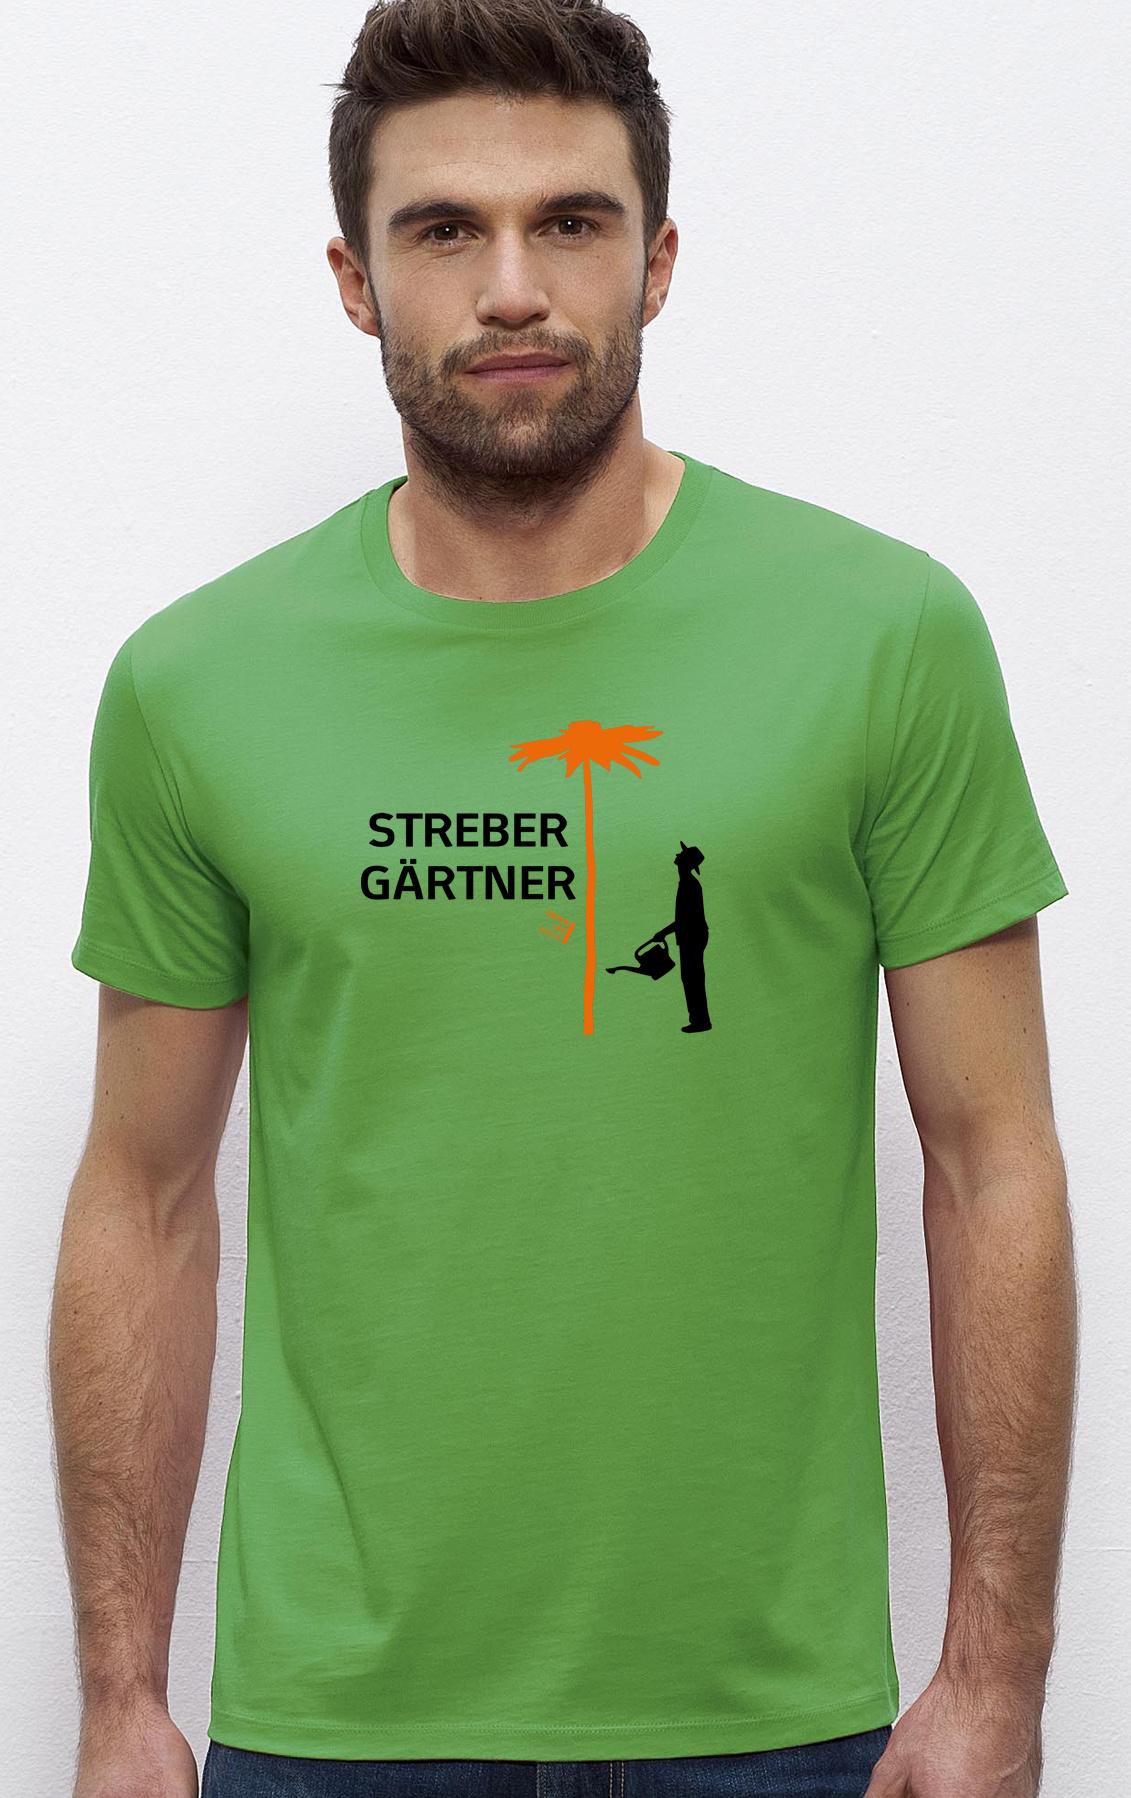 strebergaertner_entwurf_auf_gruenes_shirt.jpg